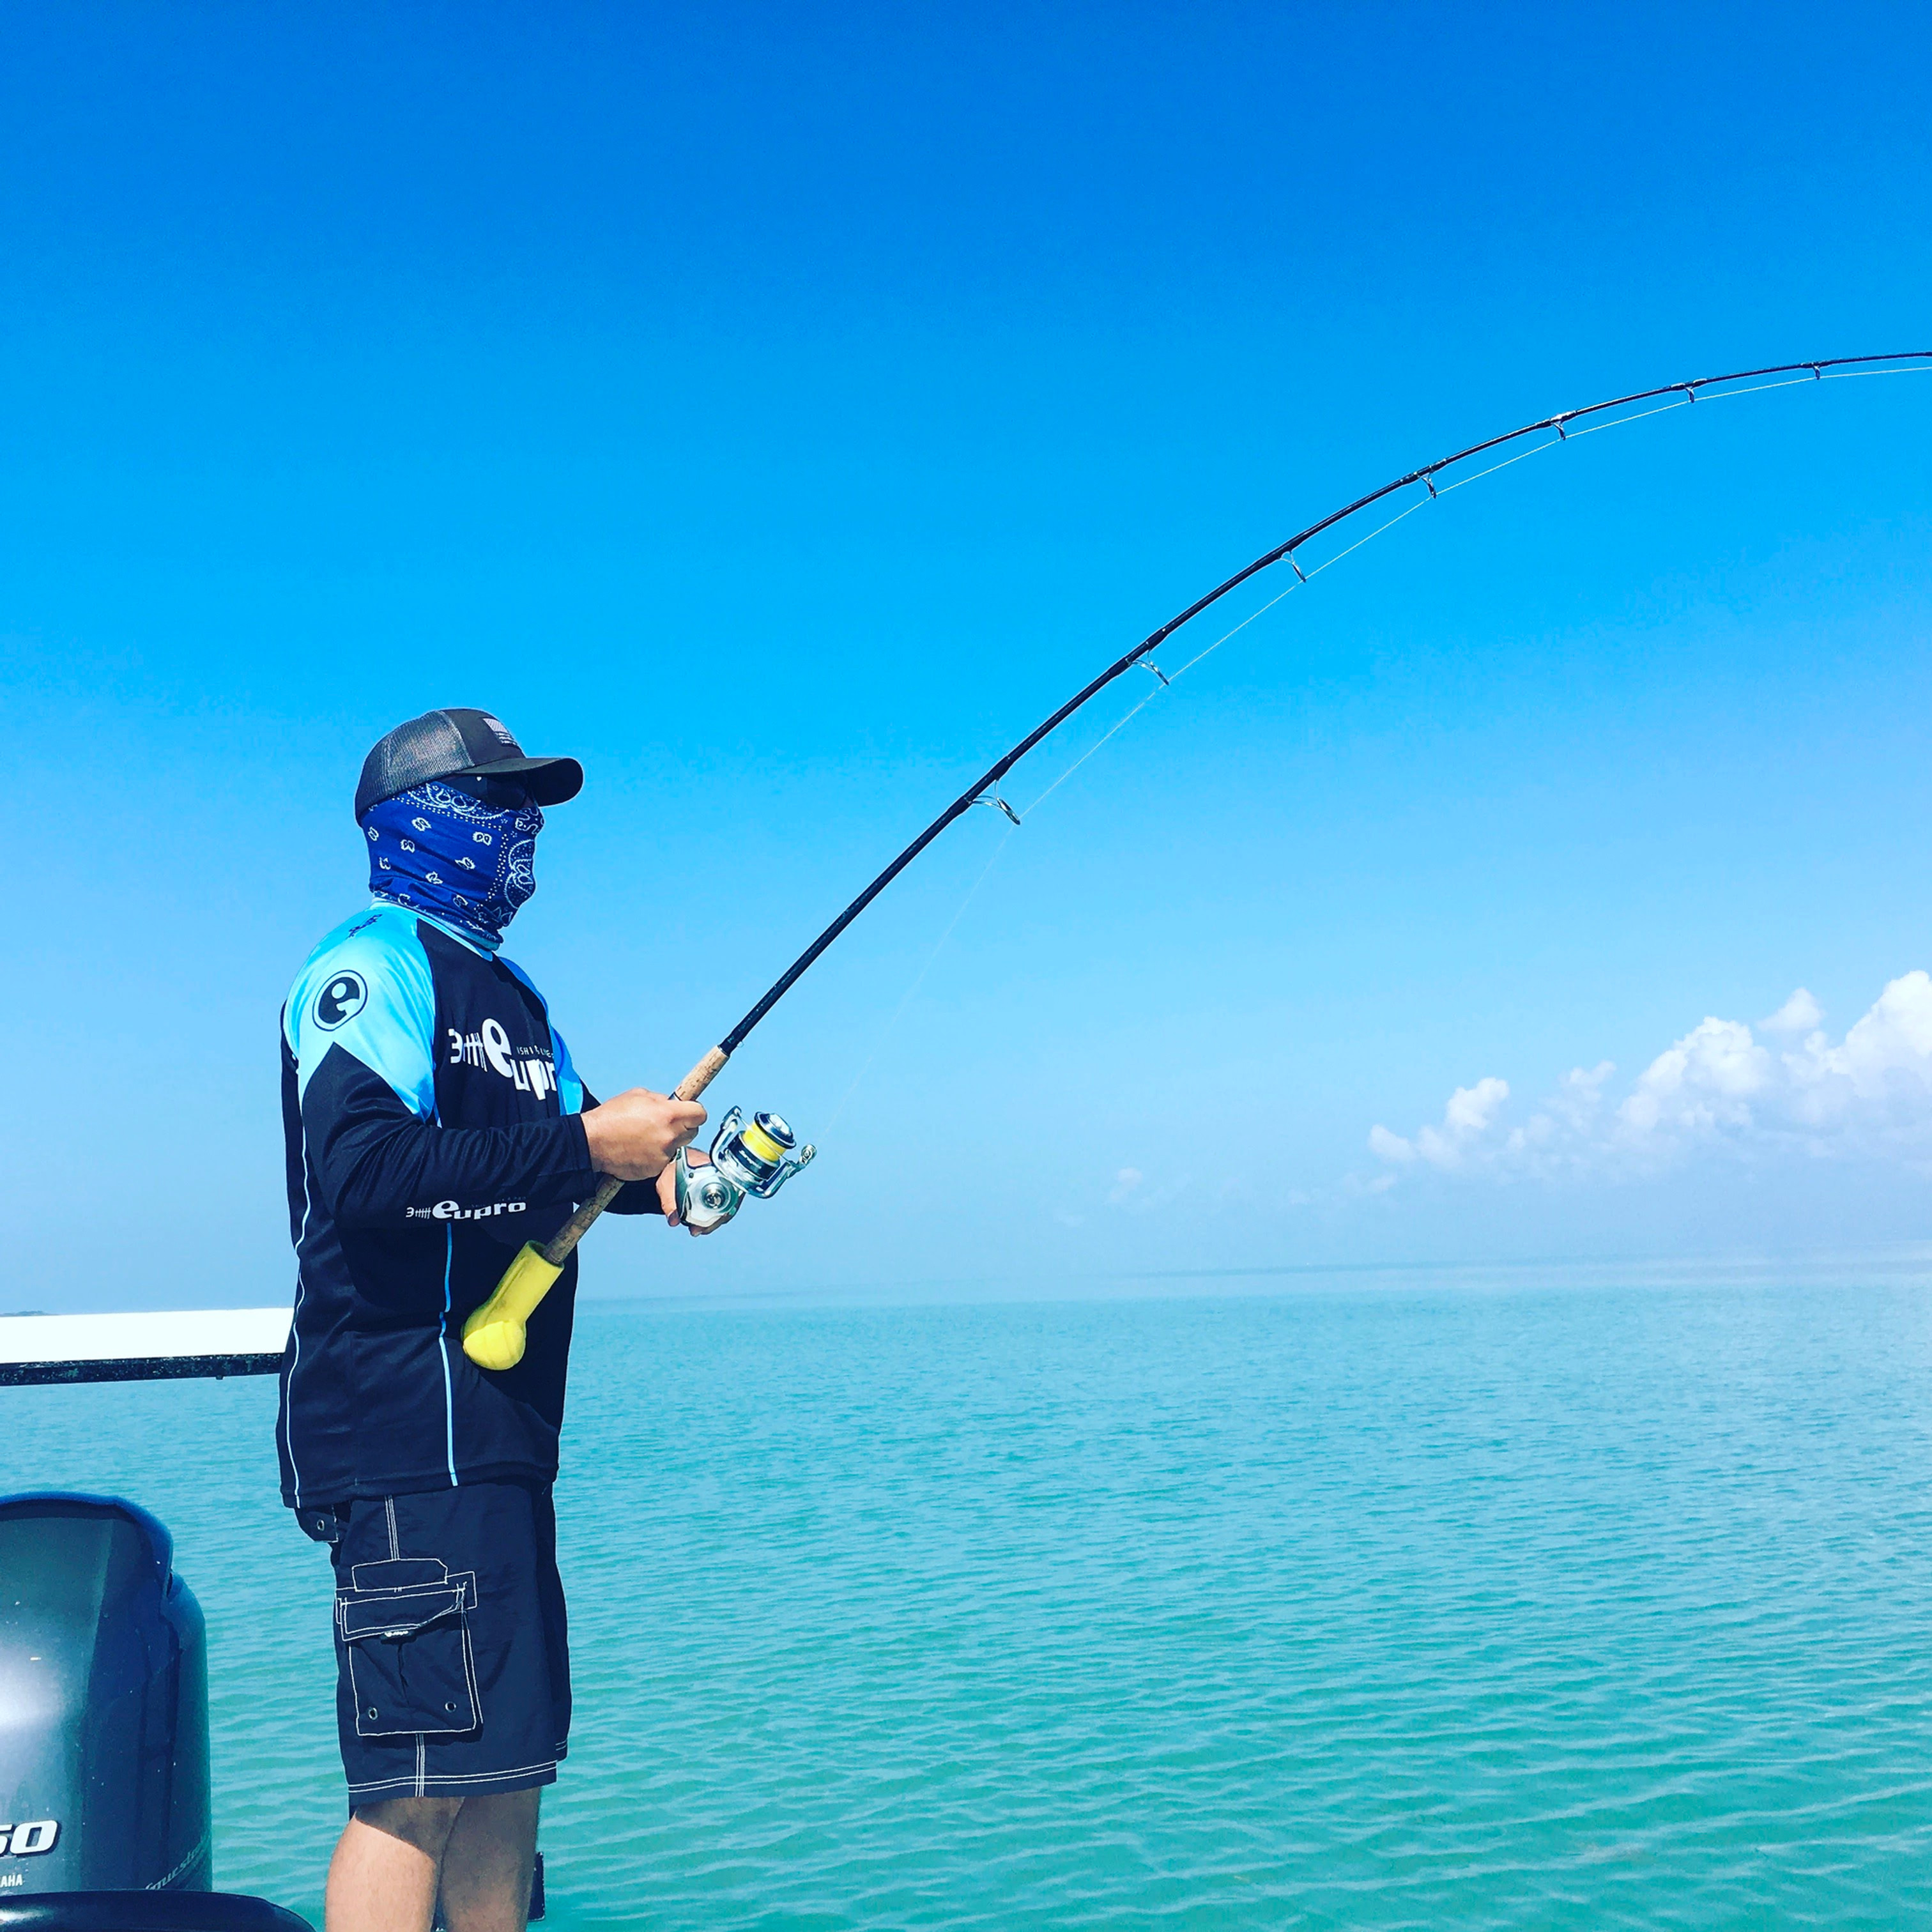 Inshore Fishing - 2 people